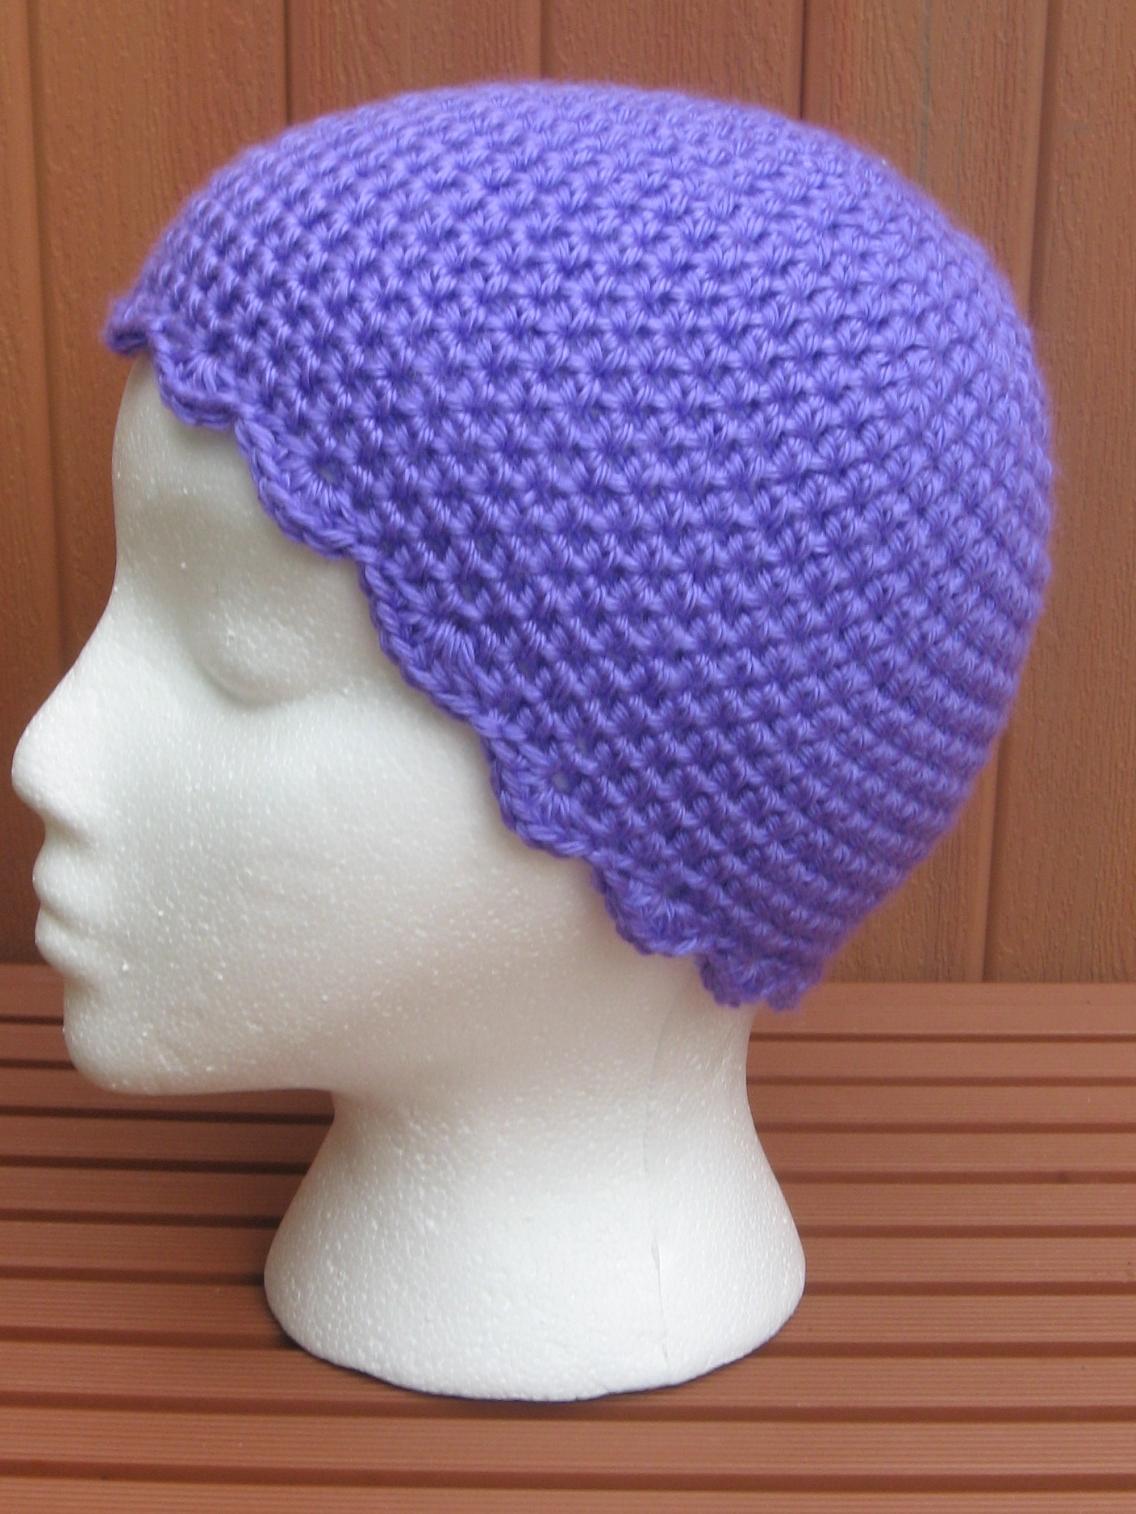 Chemo Caps Knit Patterns : Crochet Projects: Crochet Chemo Sleep Cap